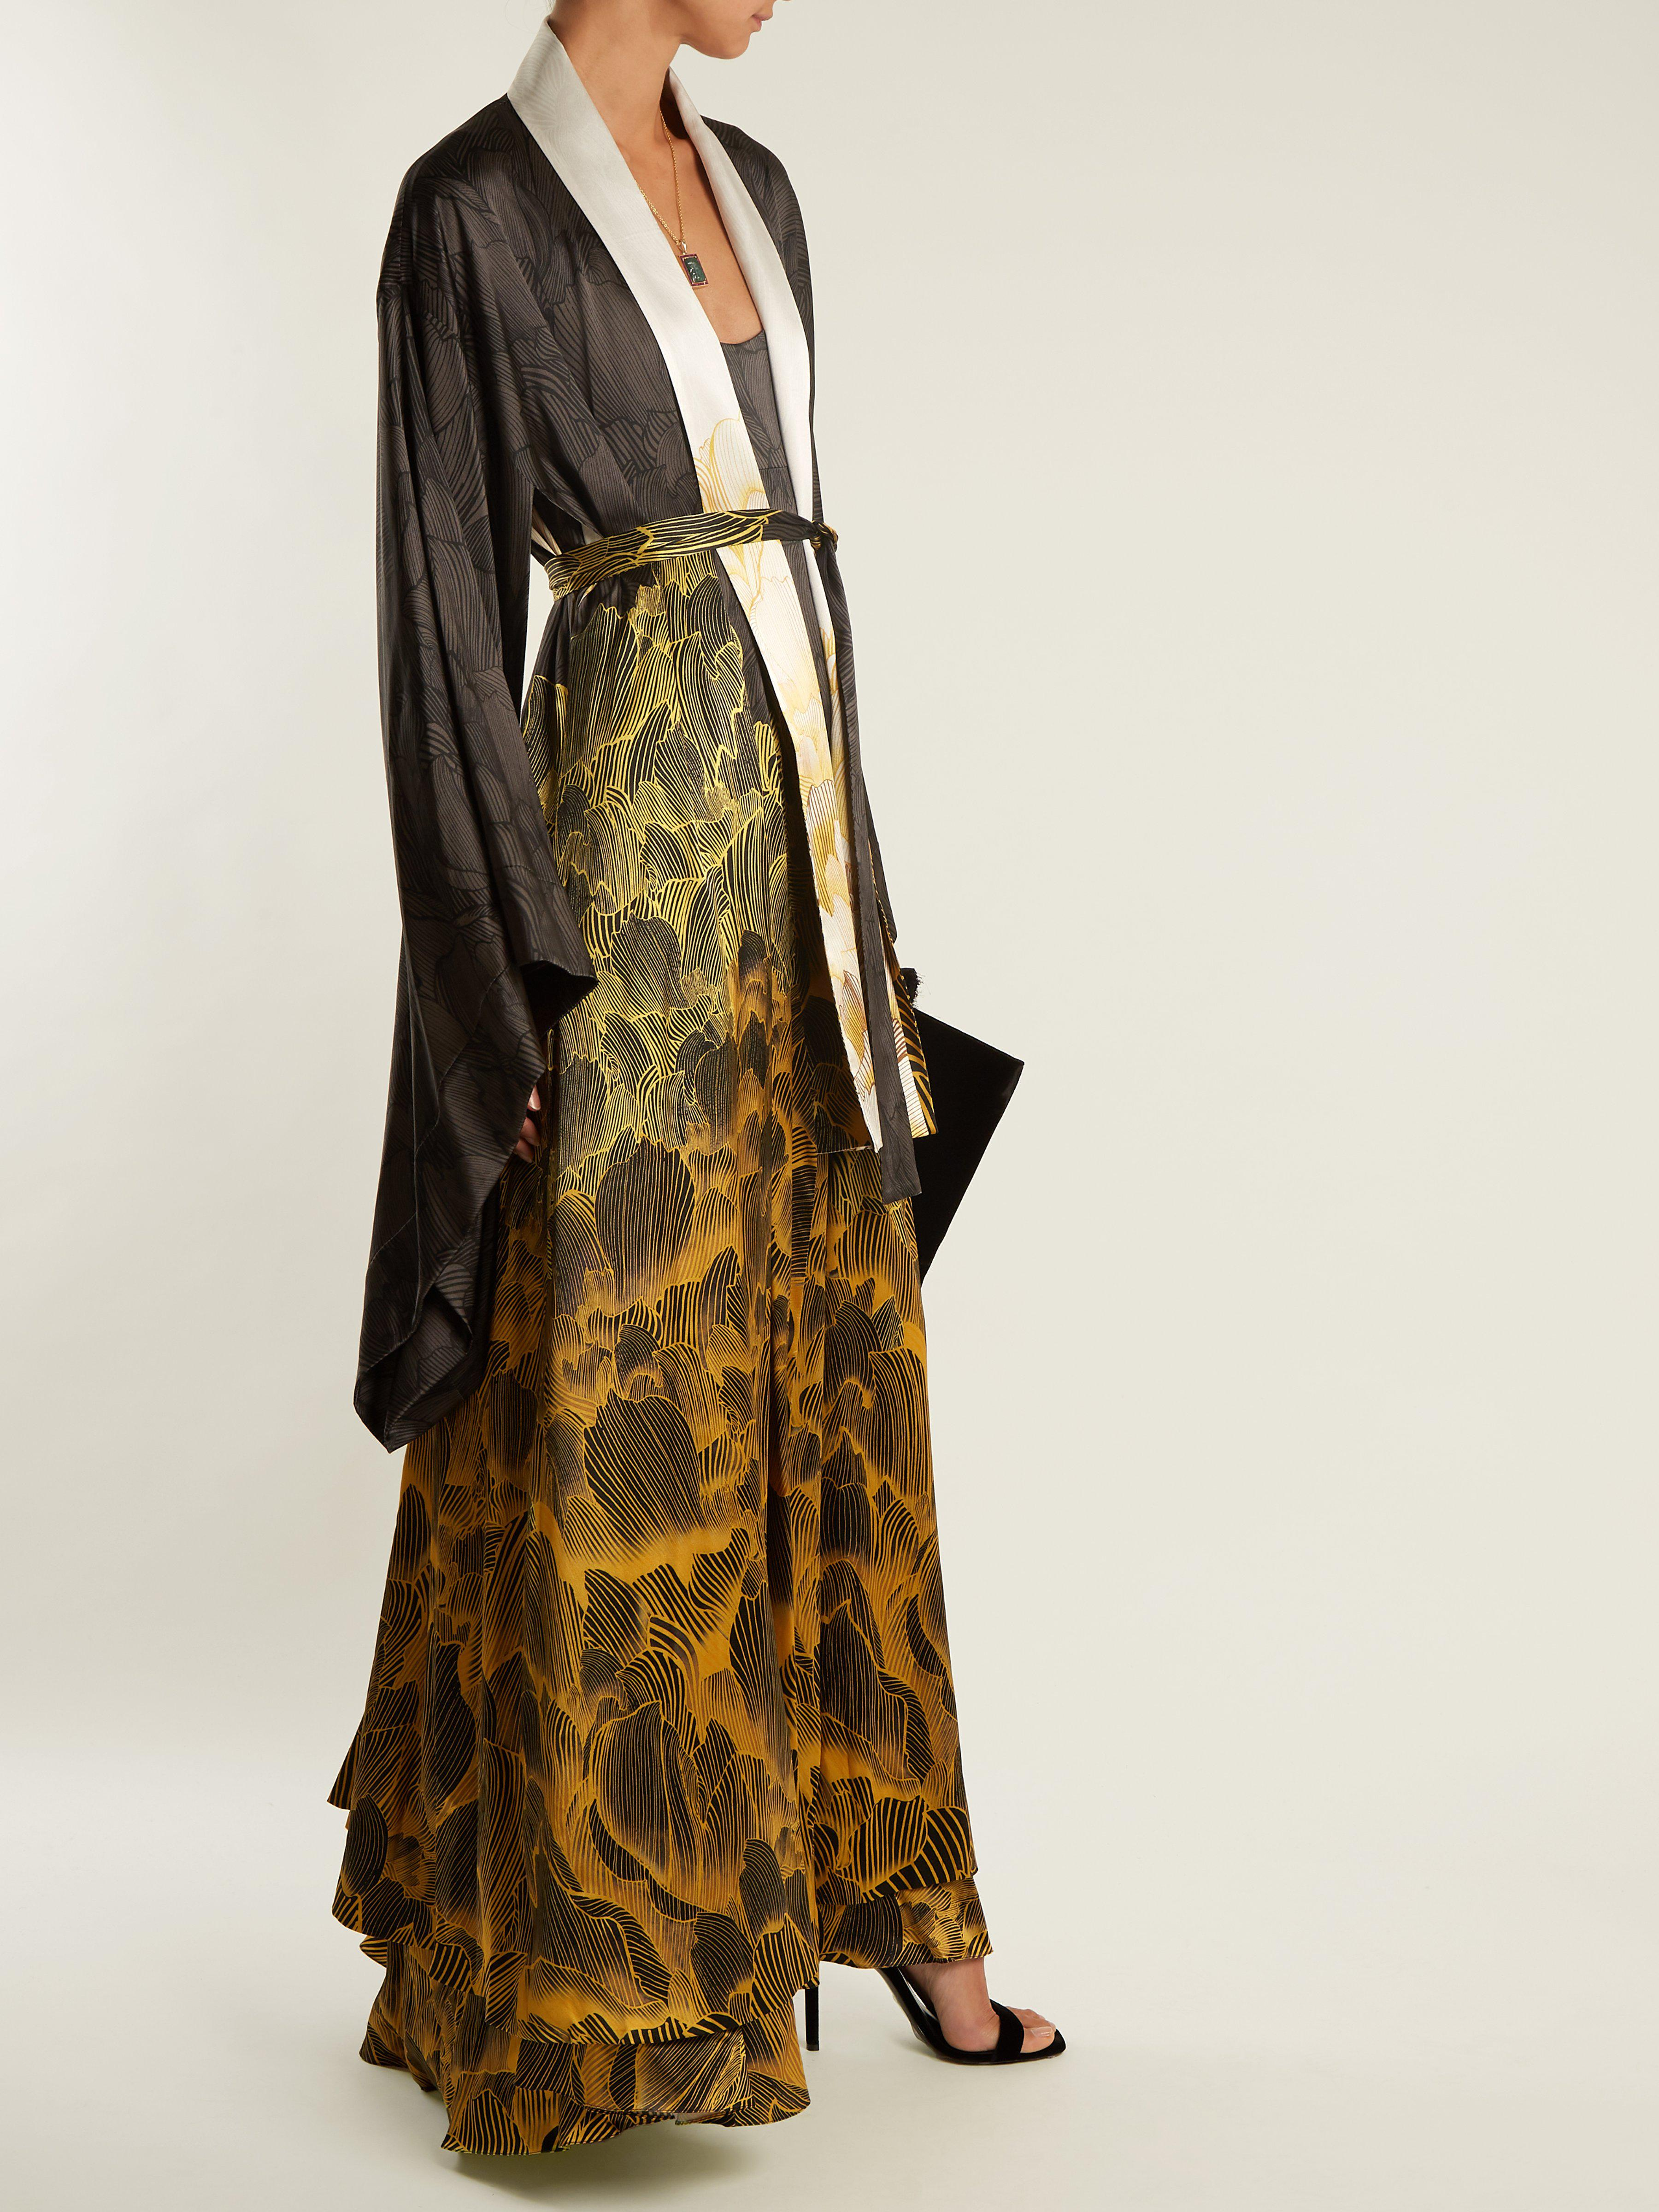 8f79790078c2e9 adriana-iglesias-black-gold-Anna -Reversible-Floral-Print-Stretch-Silk-Robe.jpeg